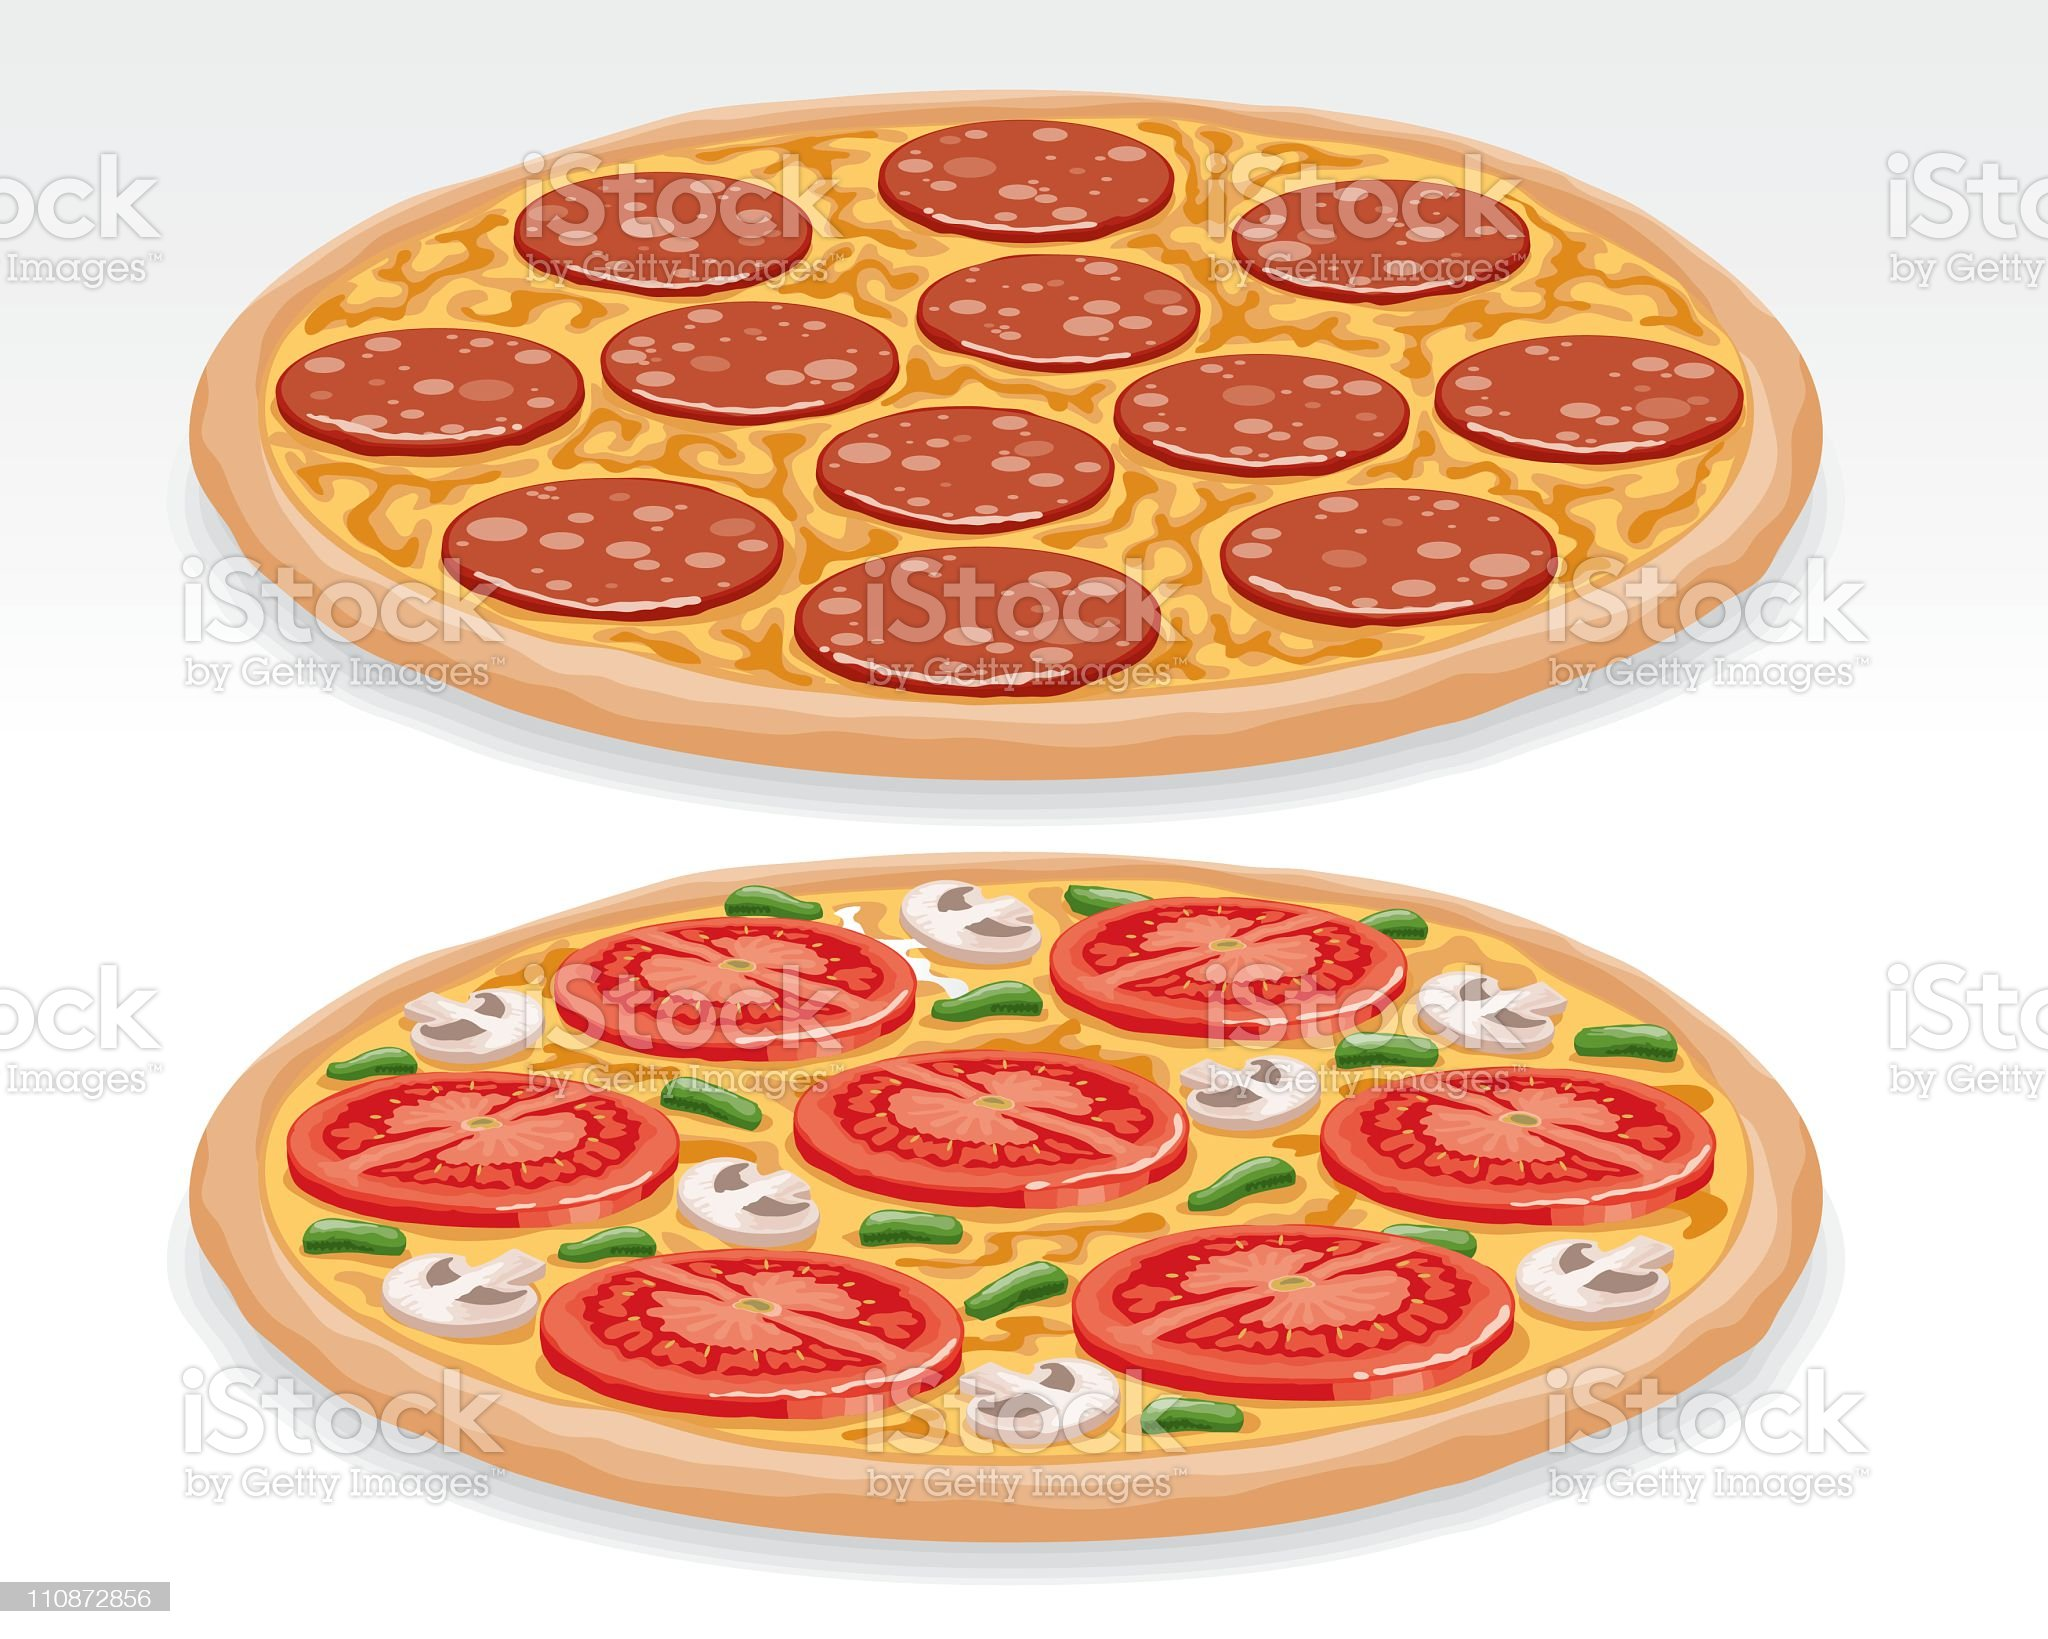 Pizzas royalty-free stock vector art